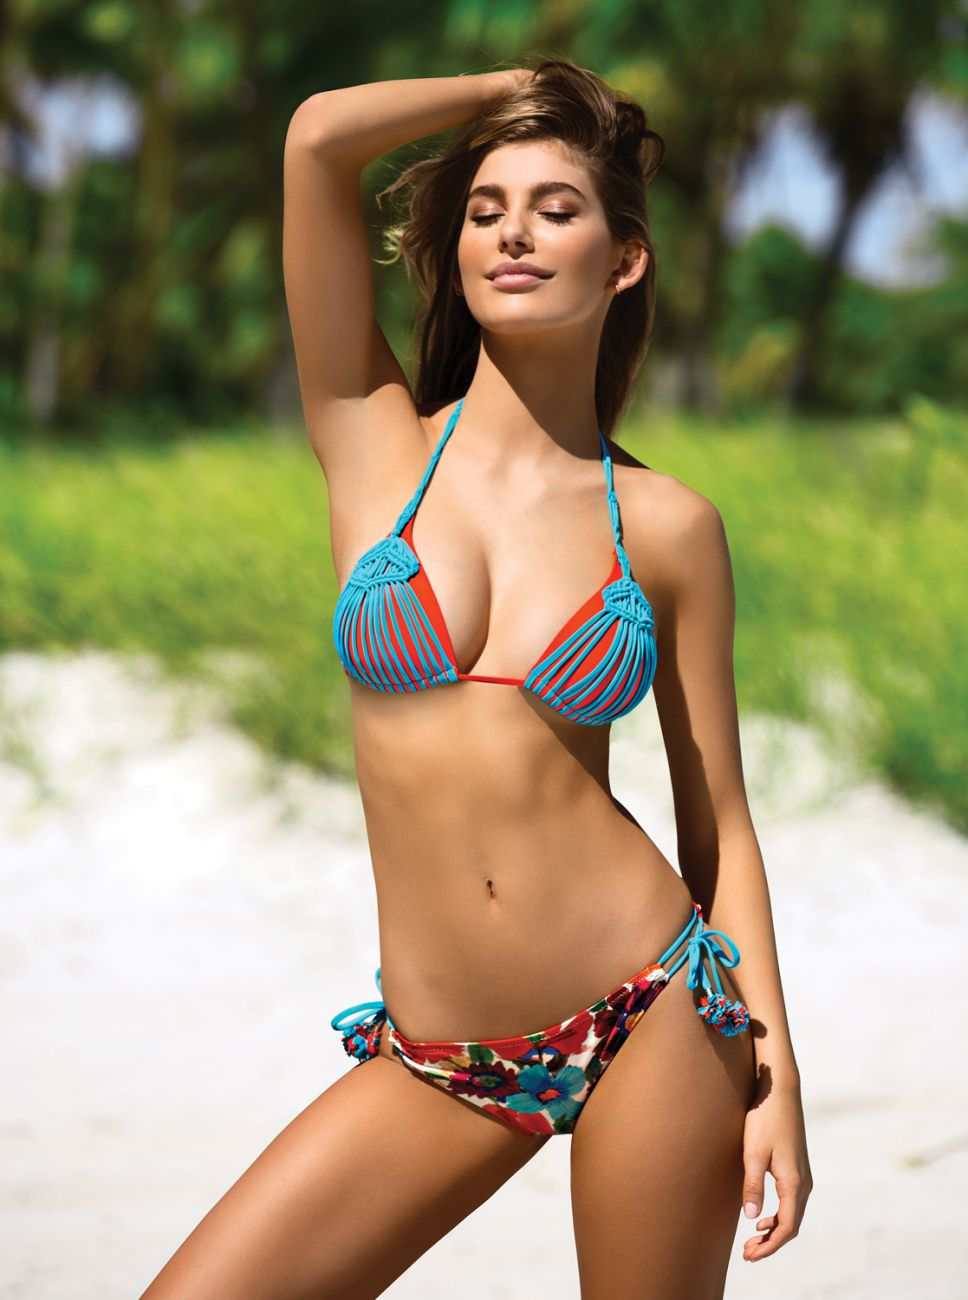 Bikini Cami Morrone nudes (48 photo), Sexy, Cleavage, Boobs, lingerie 2006